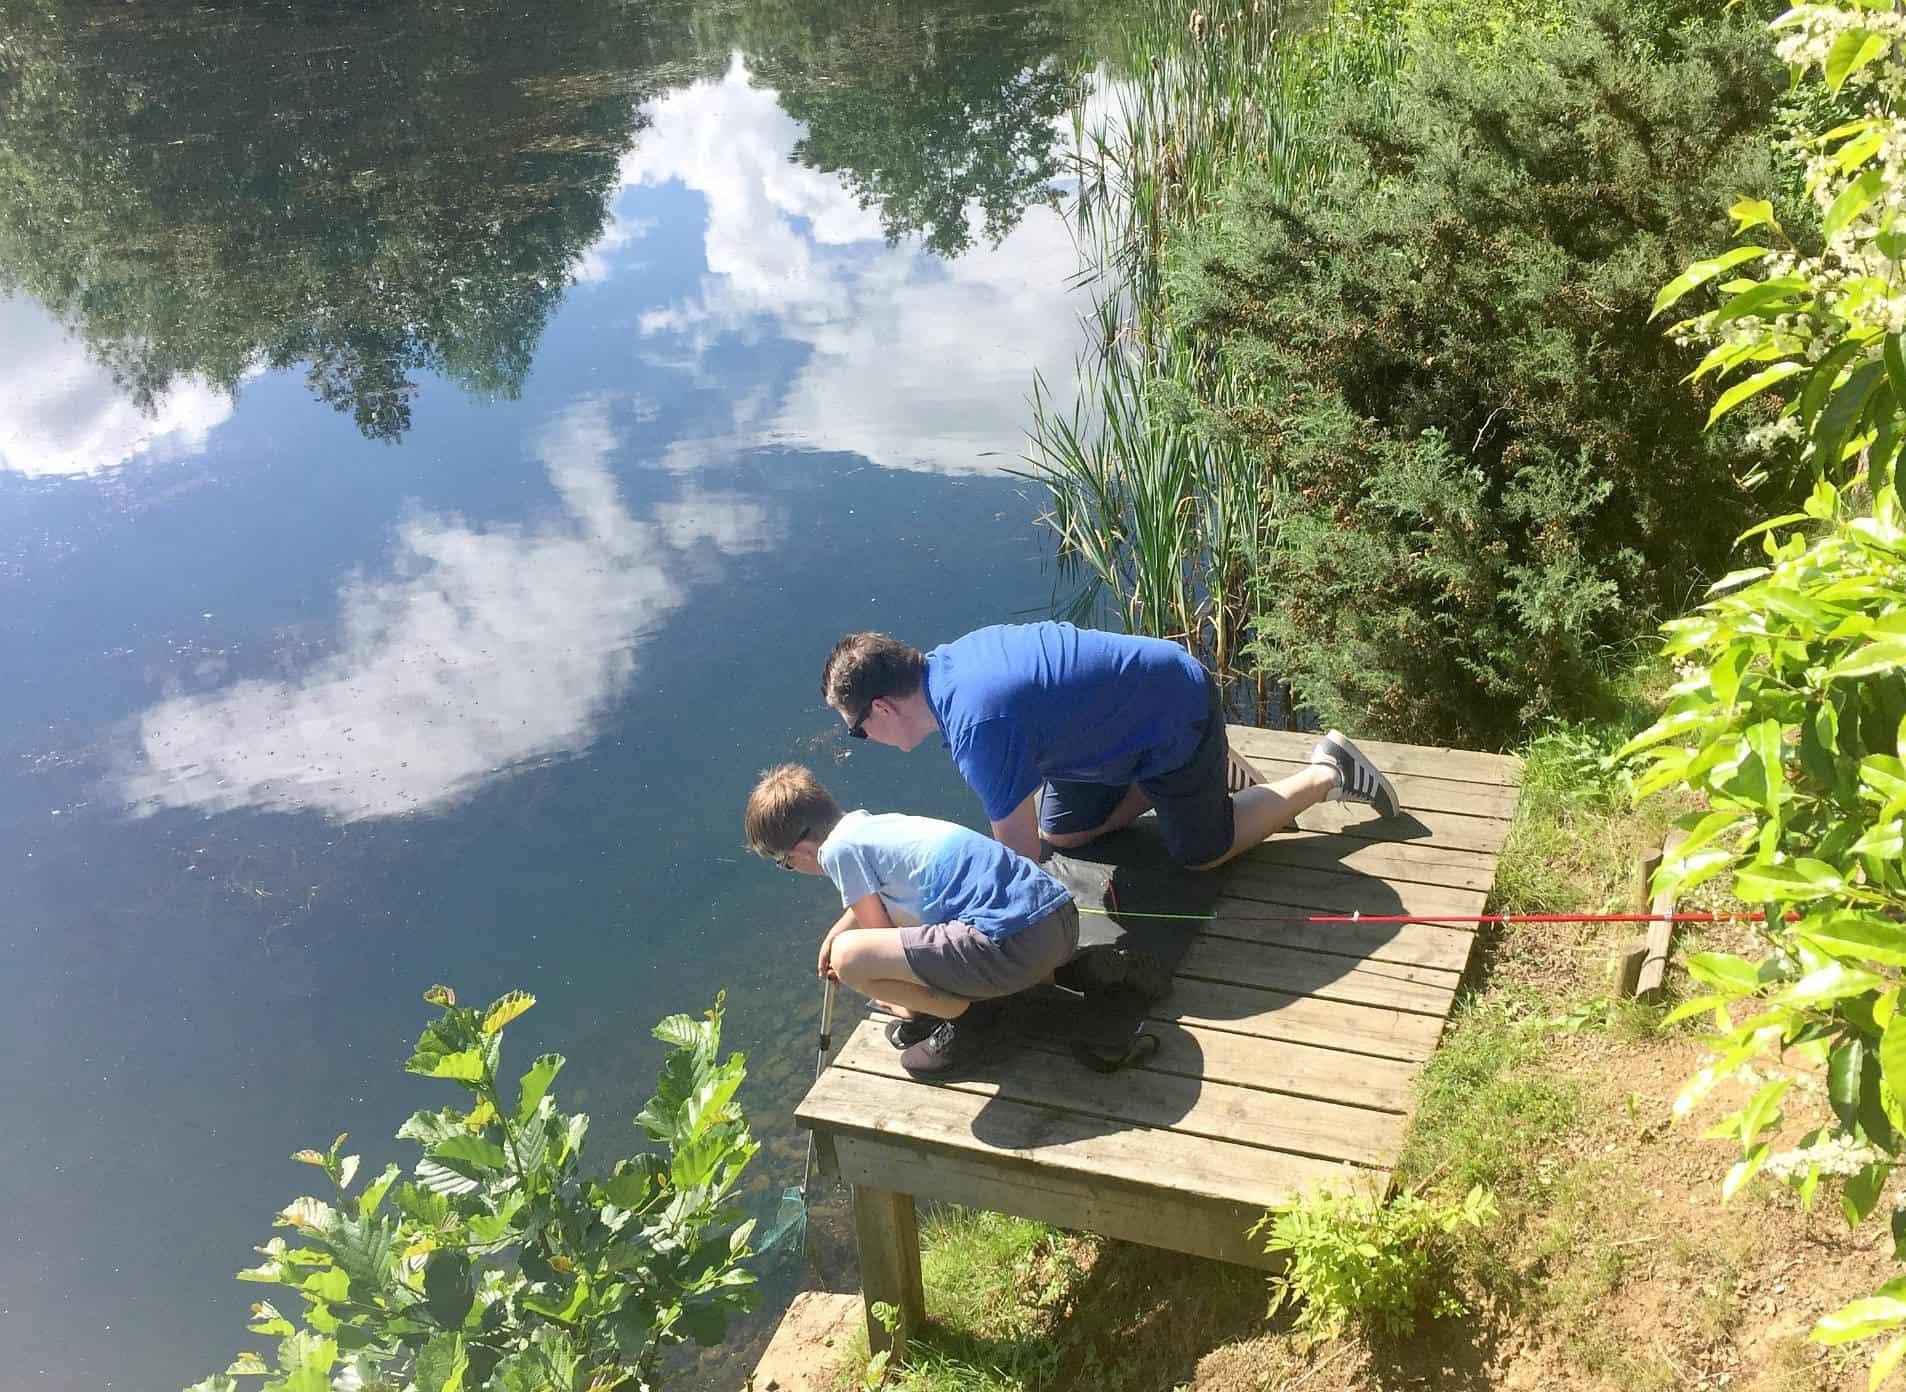 Enjoying Tranquility at Brompton Lakes a